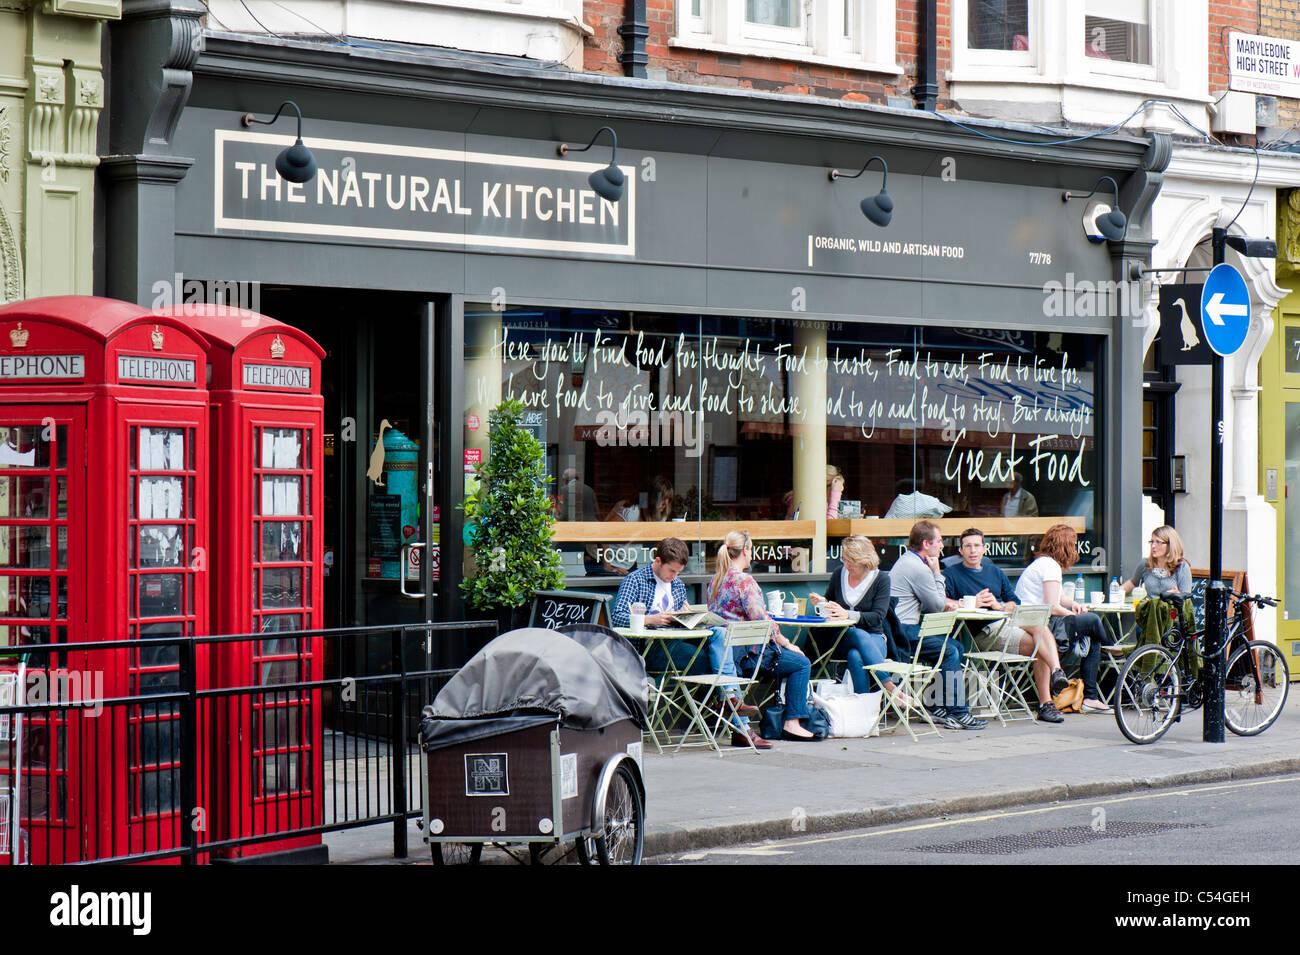 Cafe Fish Marylebone High Street